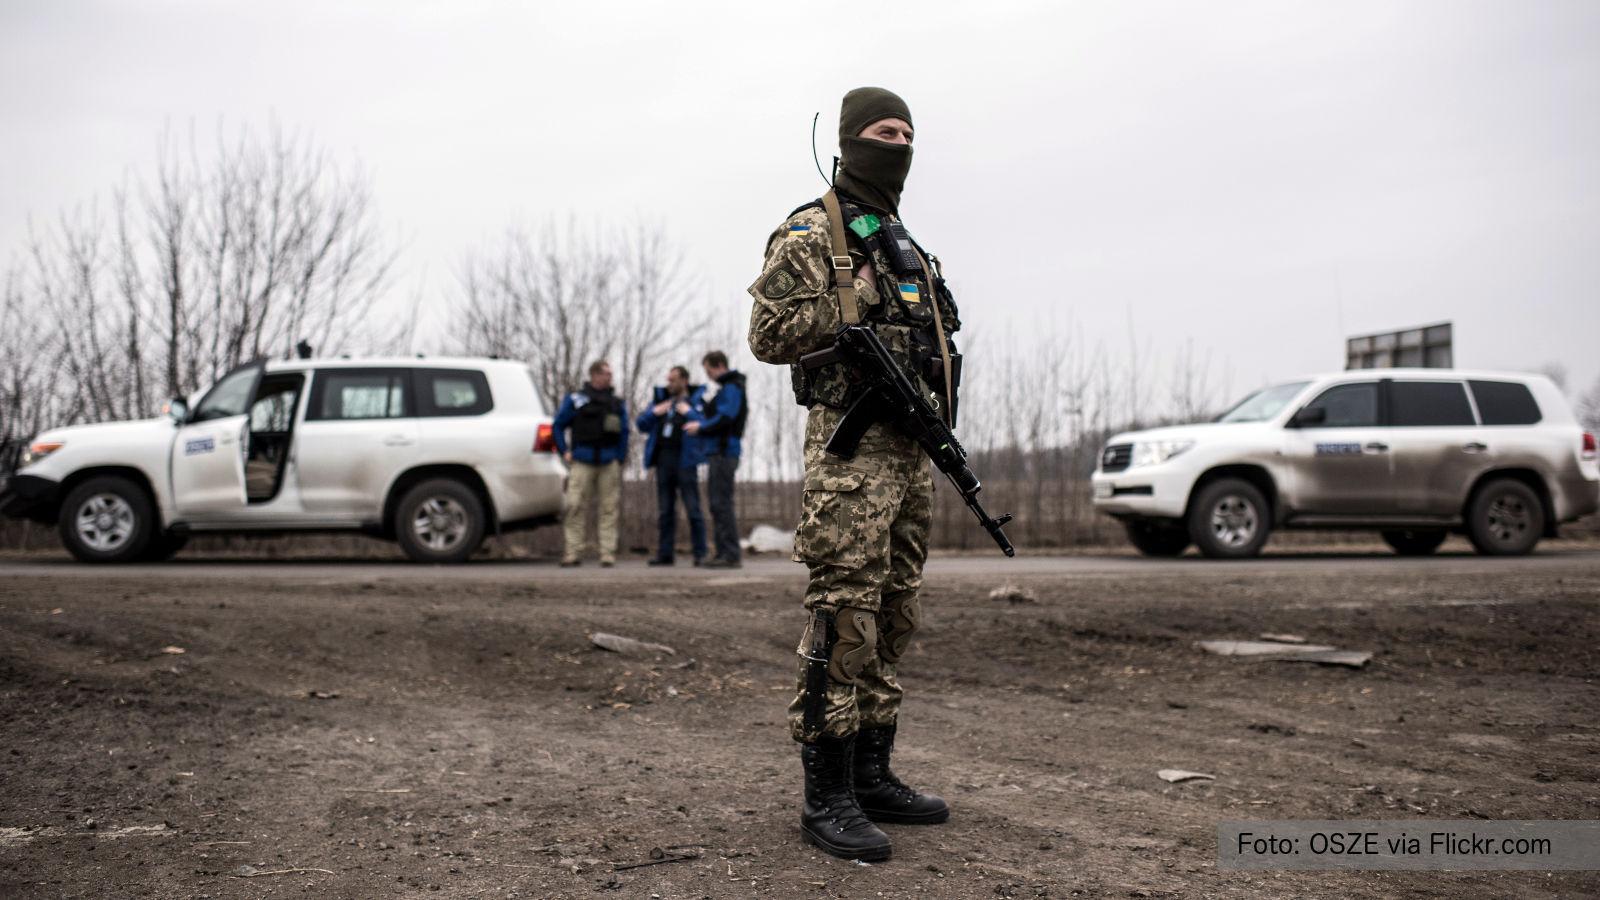 Ukrainischer Soldat vor OSZE-Beobachtern